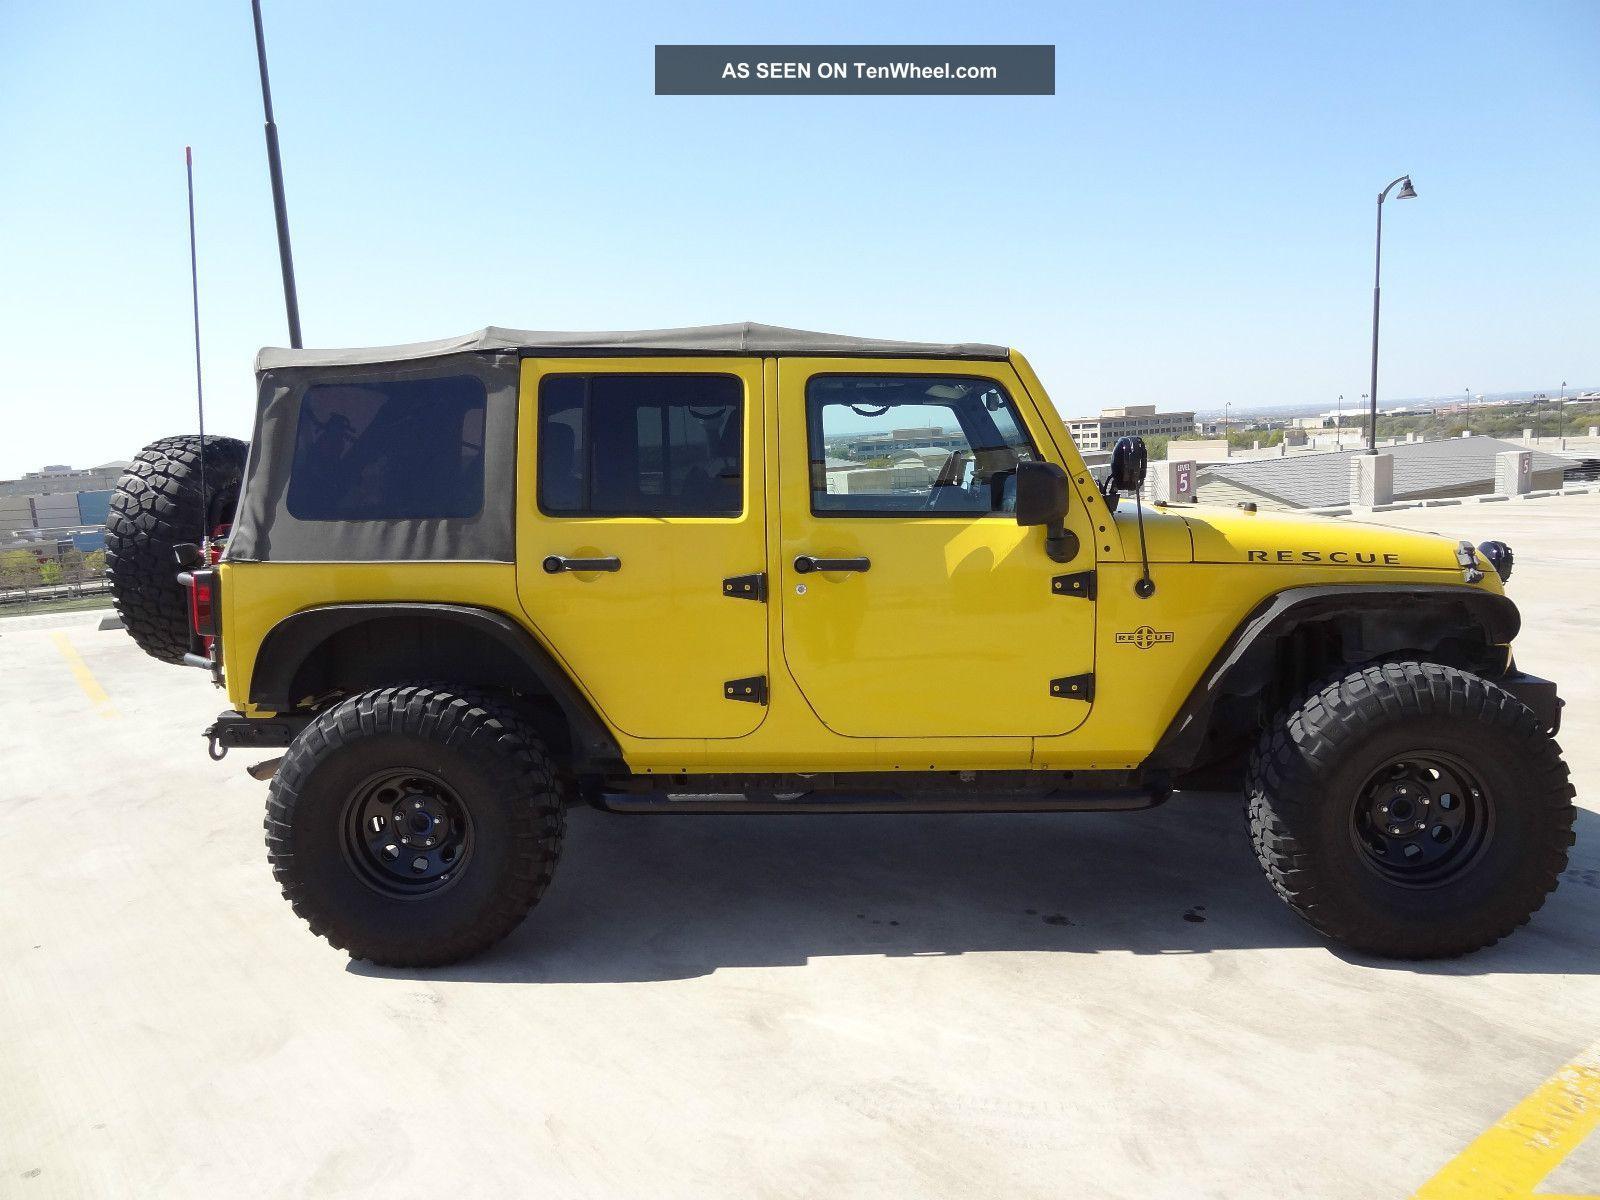 "2008 Jeep Wrangler Unlimited Jk 4x4 Lift Lights 35 "" Tires More"